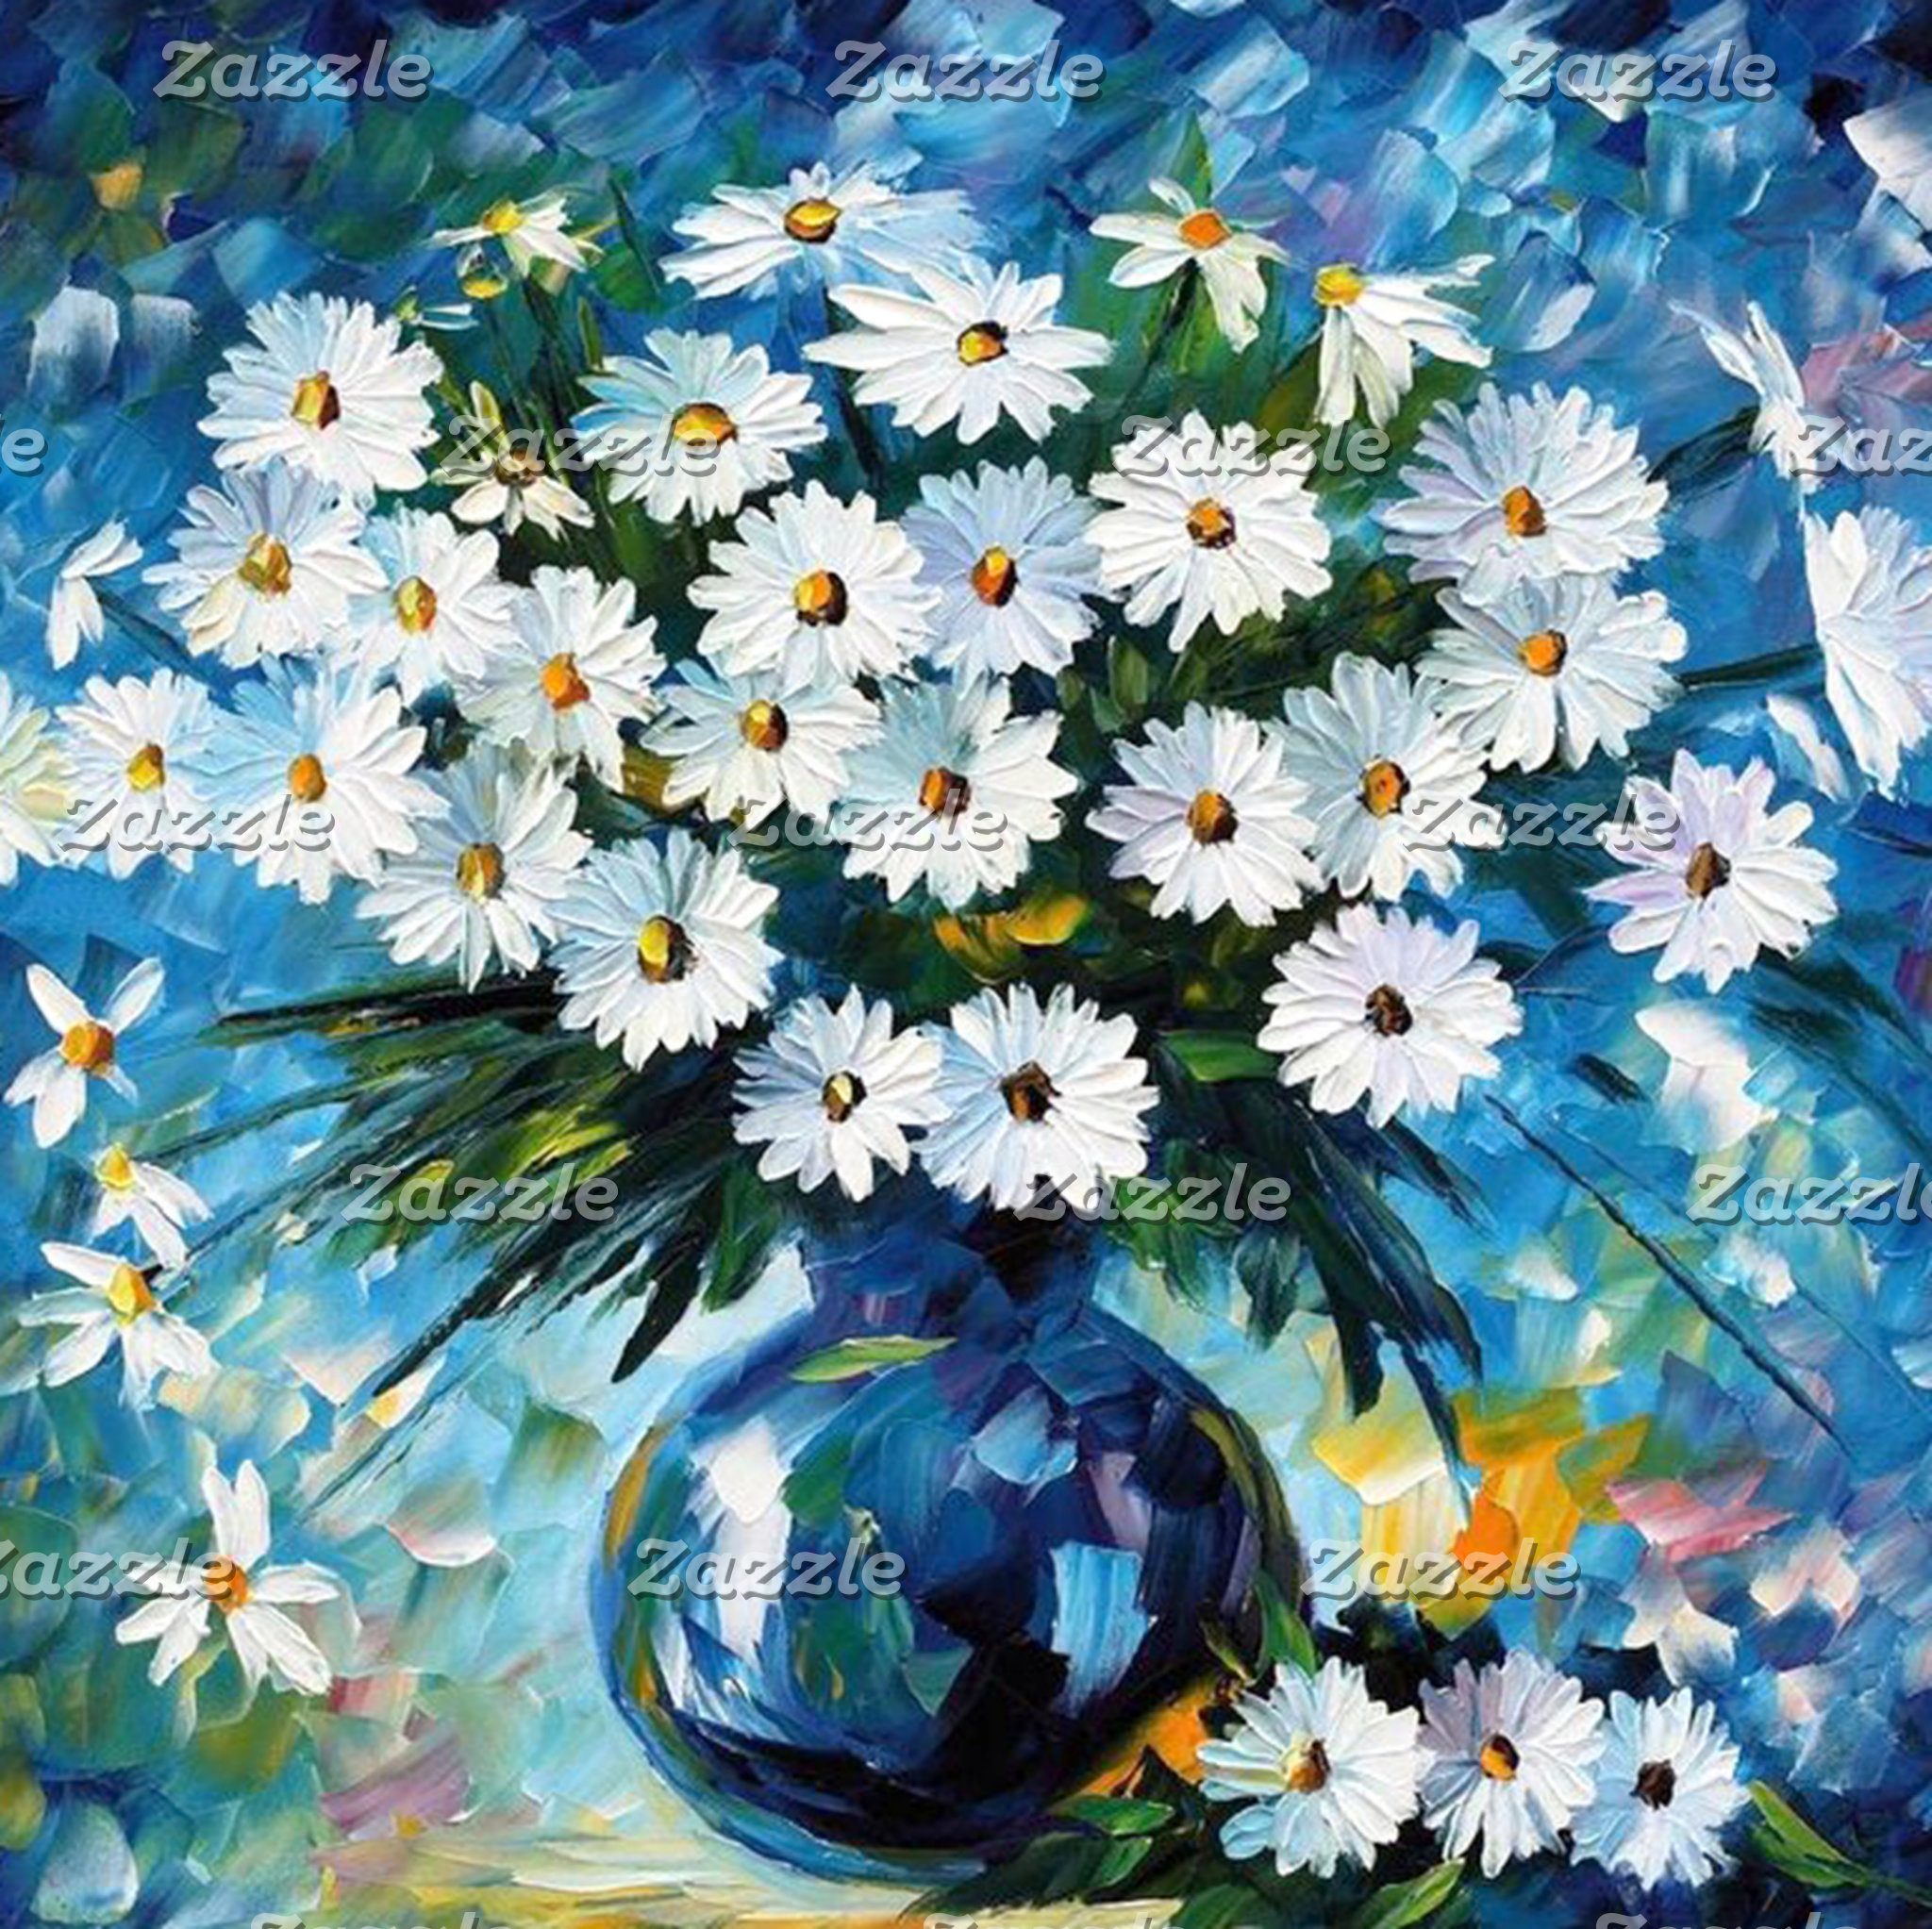 *Floral, Flower, Foliage